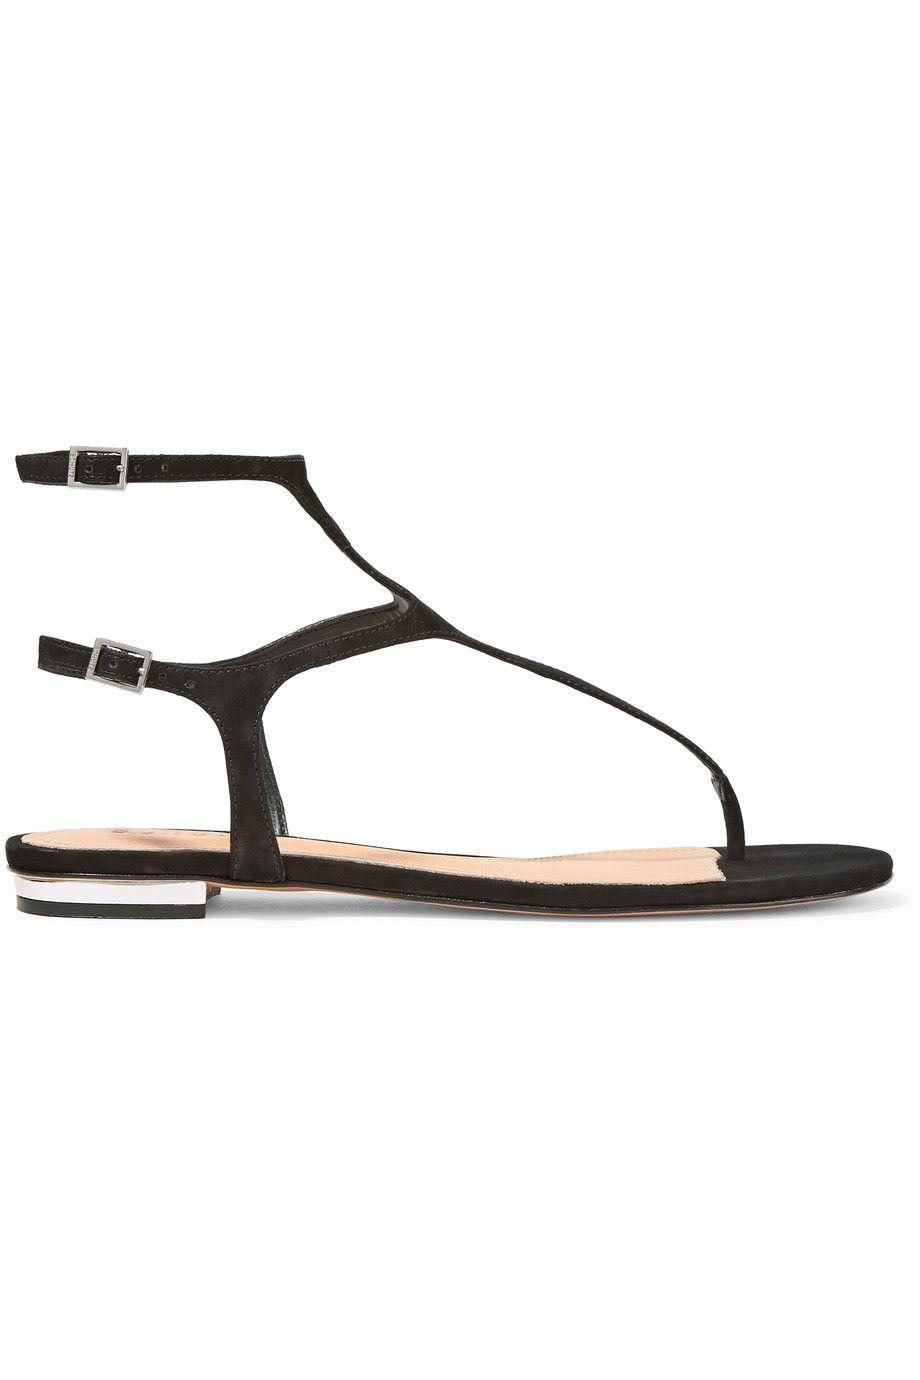 f18a031b8 SCHUTZ Galey Cutout Suede Sandals. #schutz #shoes #sandals | Schutz ...